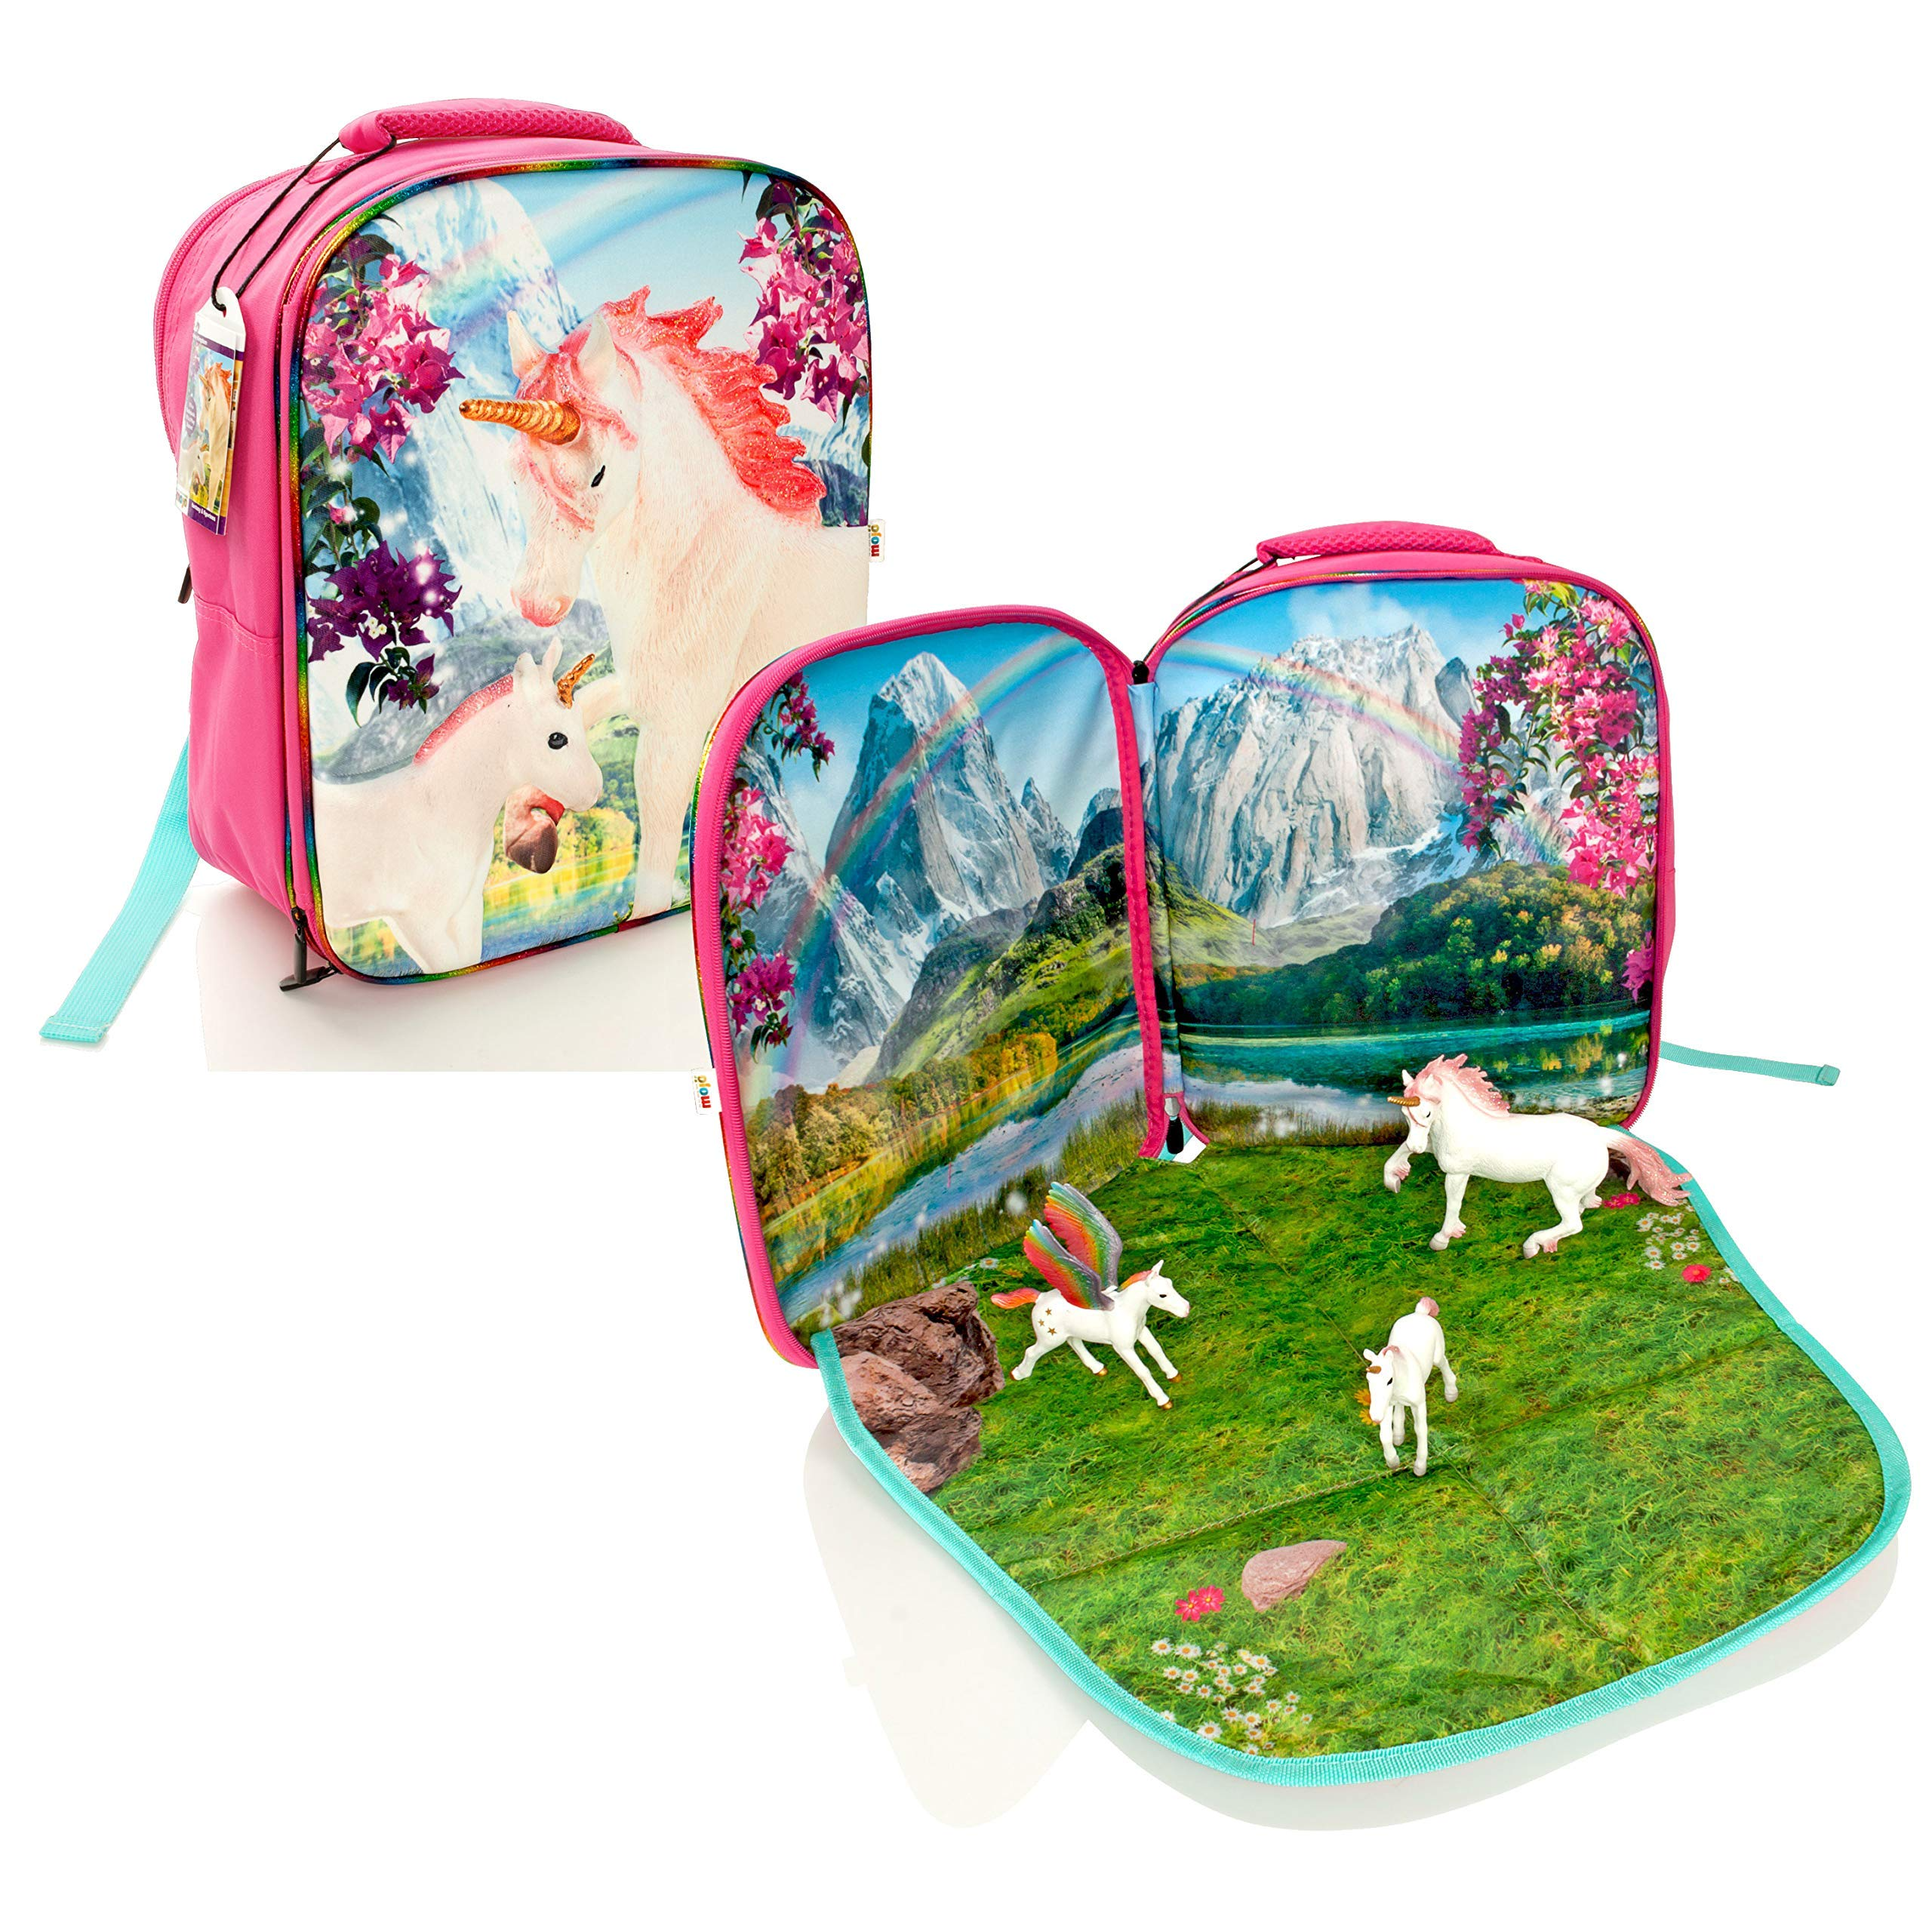 MOJO Fantasy Play Scene Backpack & 3 Unicorn/Pegasus Figures Playset - Childrens Play Mat